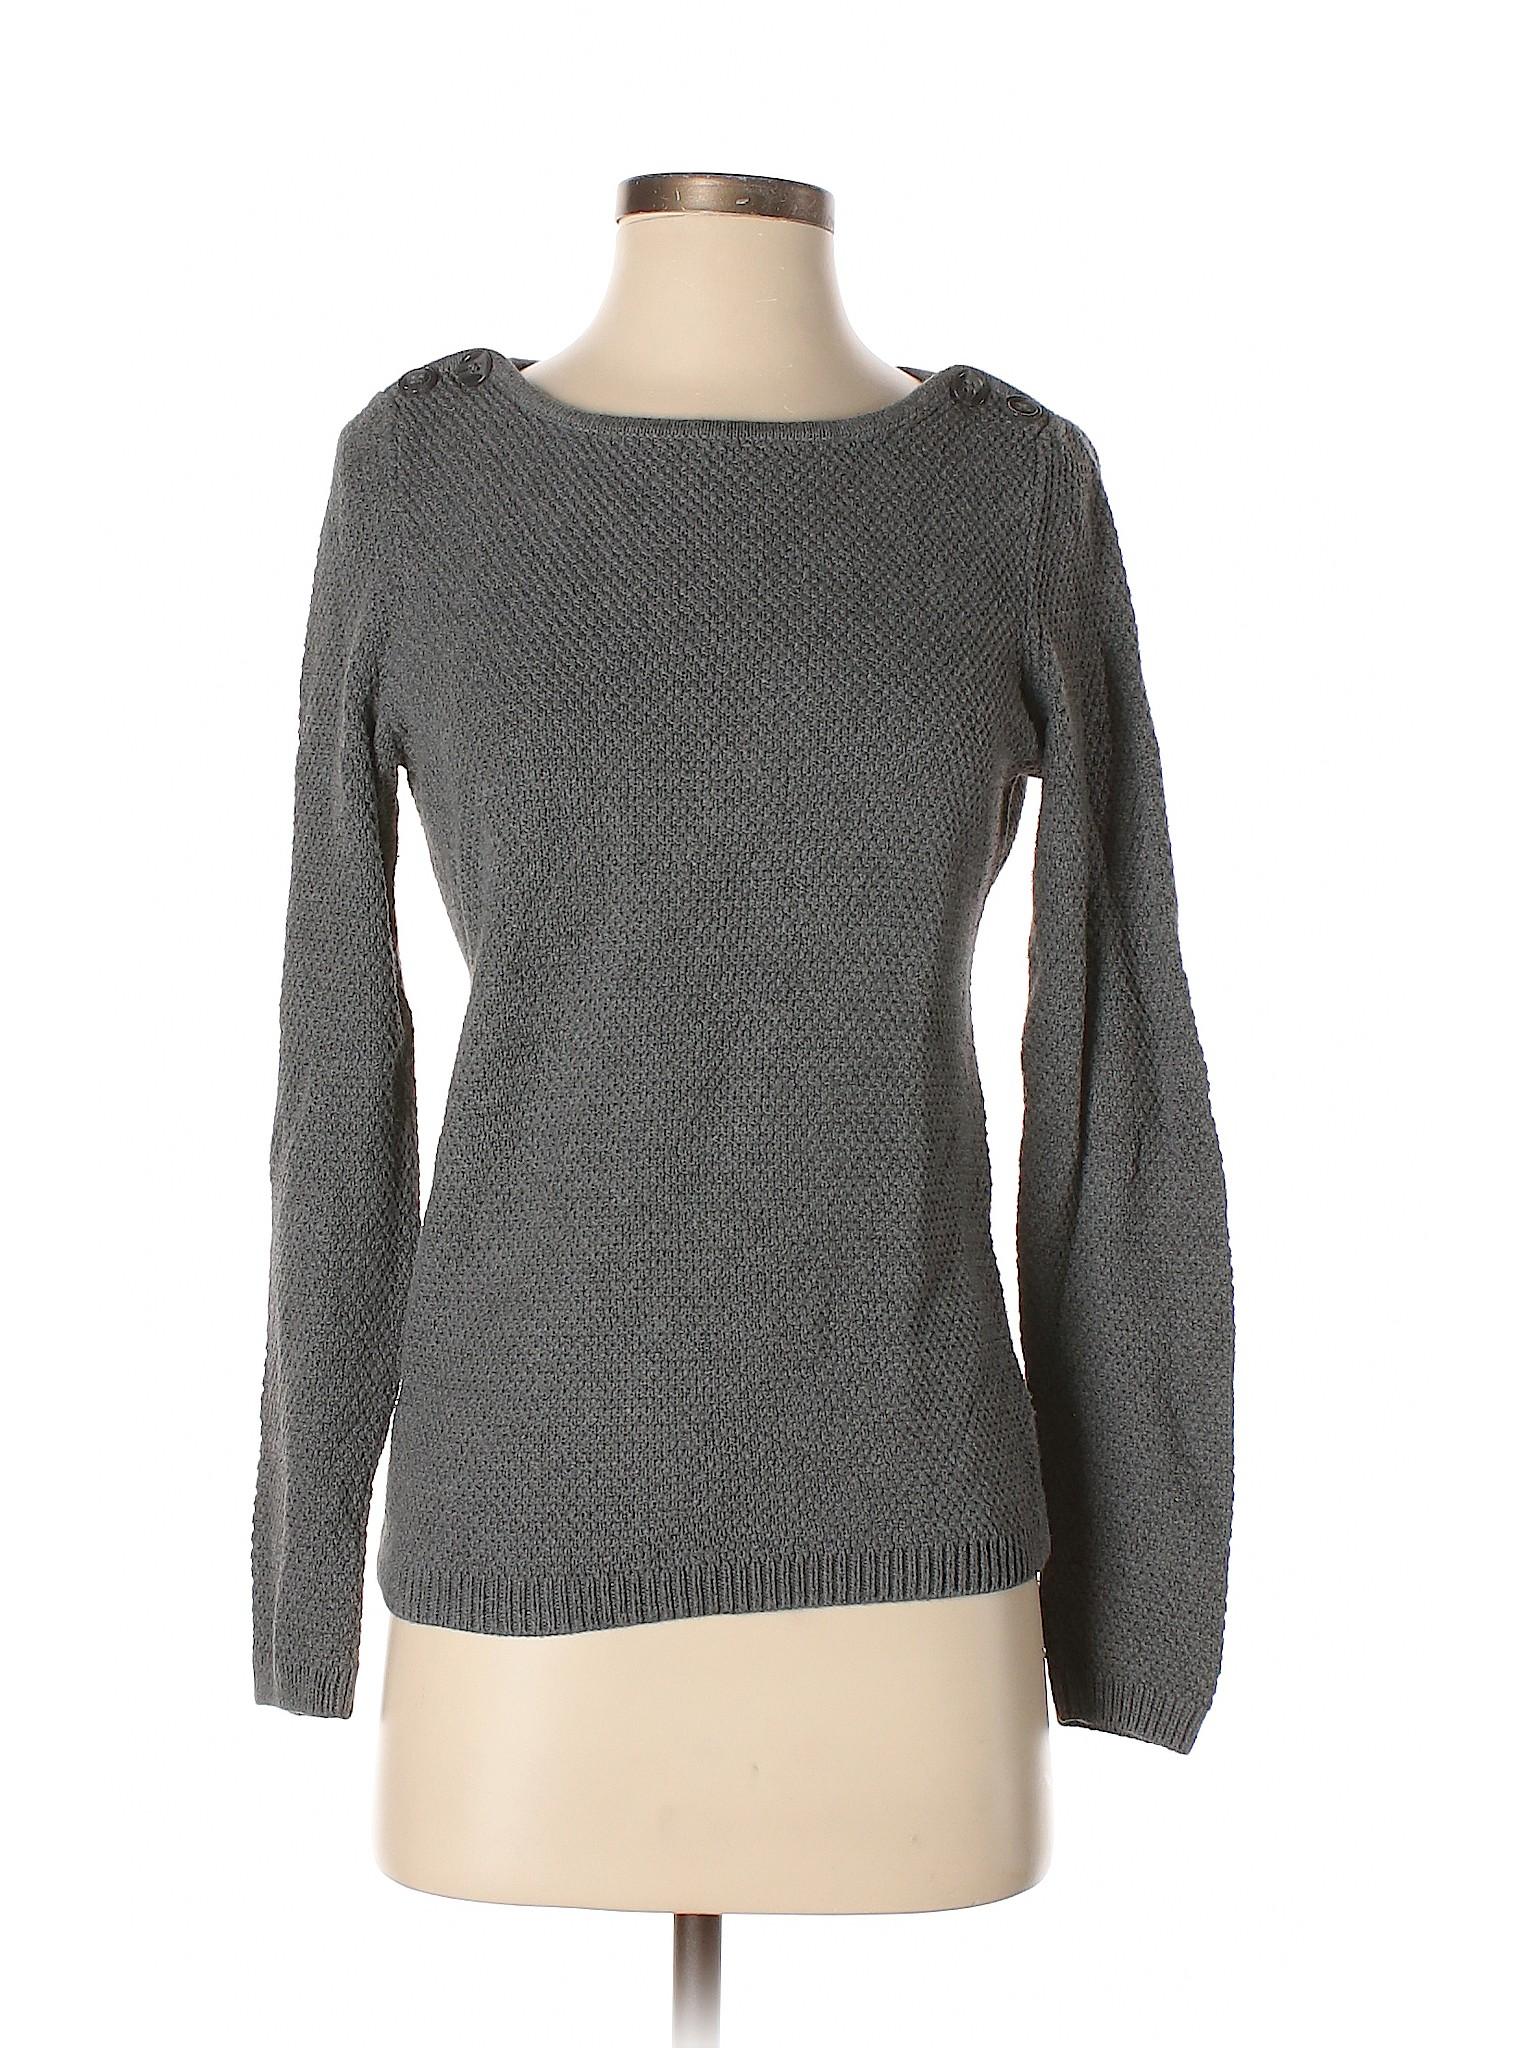 Ann Sweater Pullover Taylor LOFT Boutique dOzYqw8xq